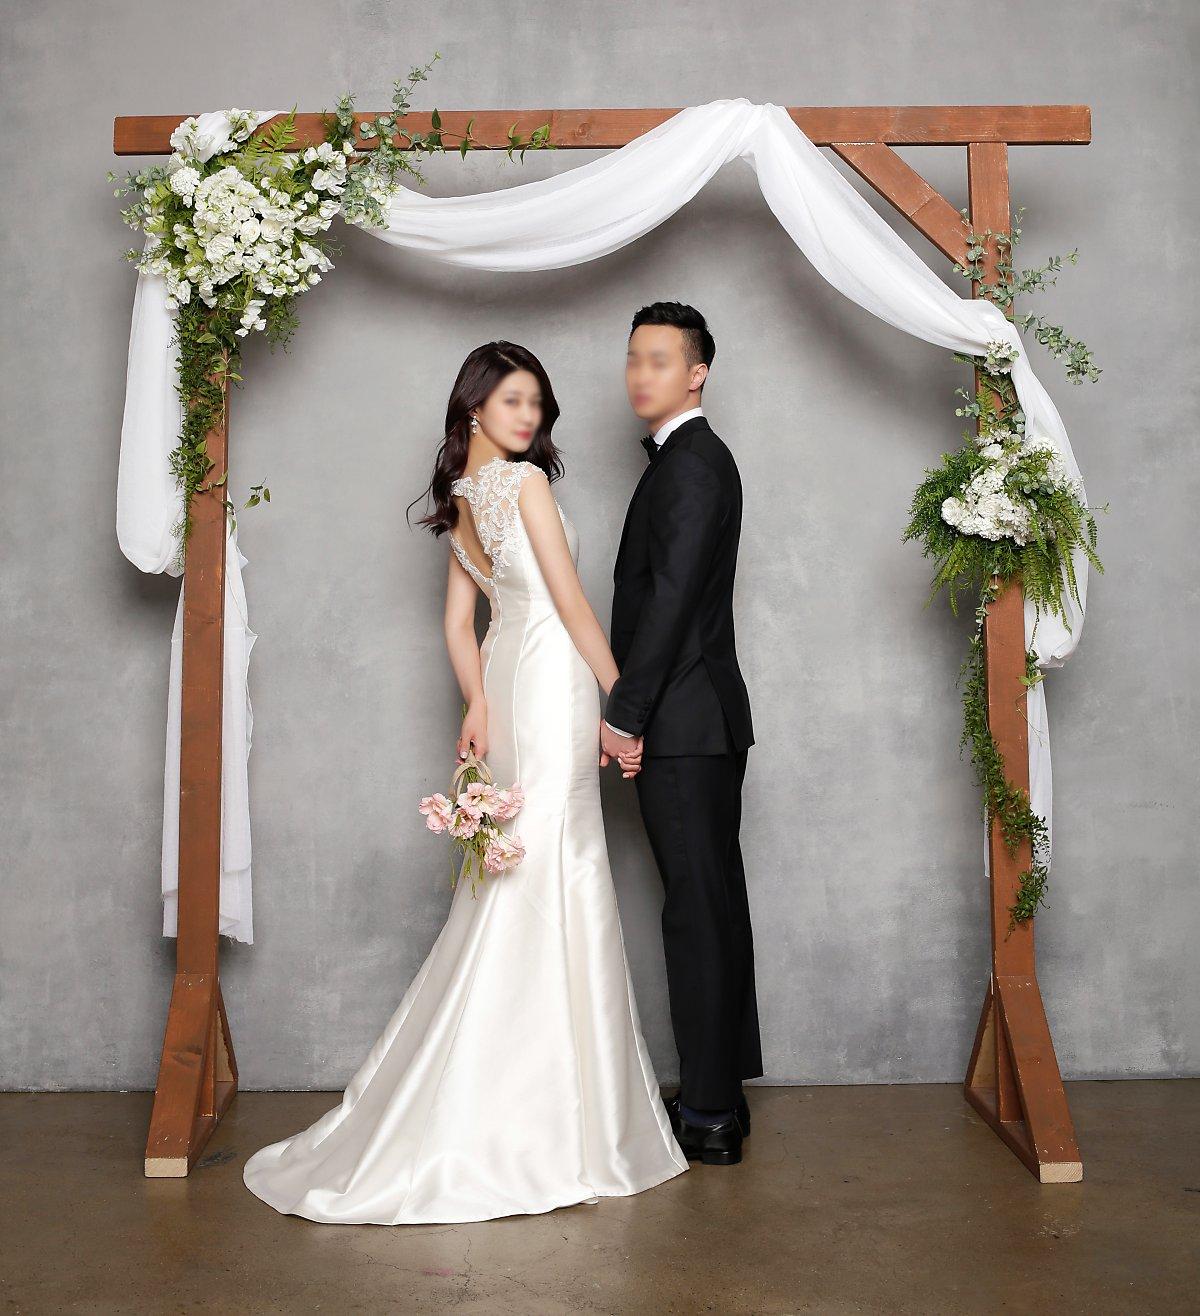 6c5f2f20854 결혼예복으로 무조건 울 함유량이 높은 원단을 추천드리는 것은 아닙니다 최근 결혼예복은 결혼식 이후 일반 정장으로 활용되기 때문에